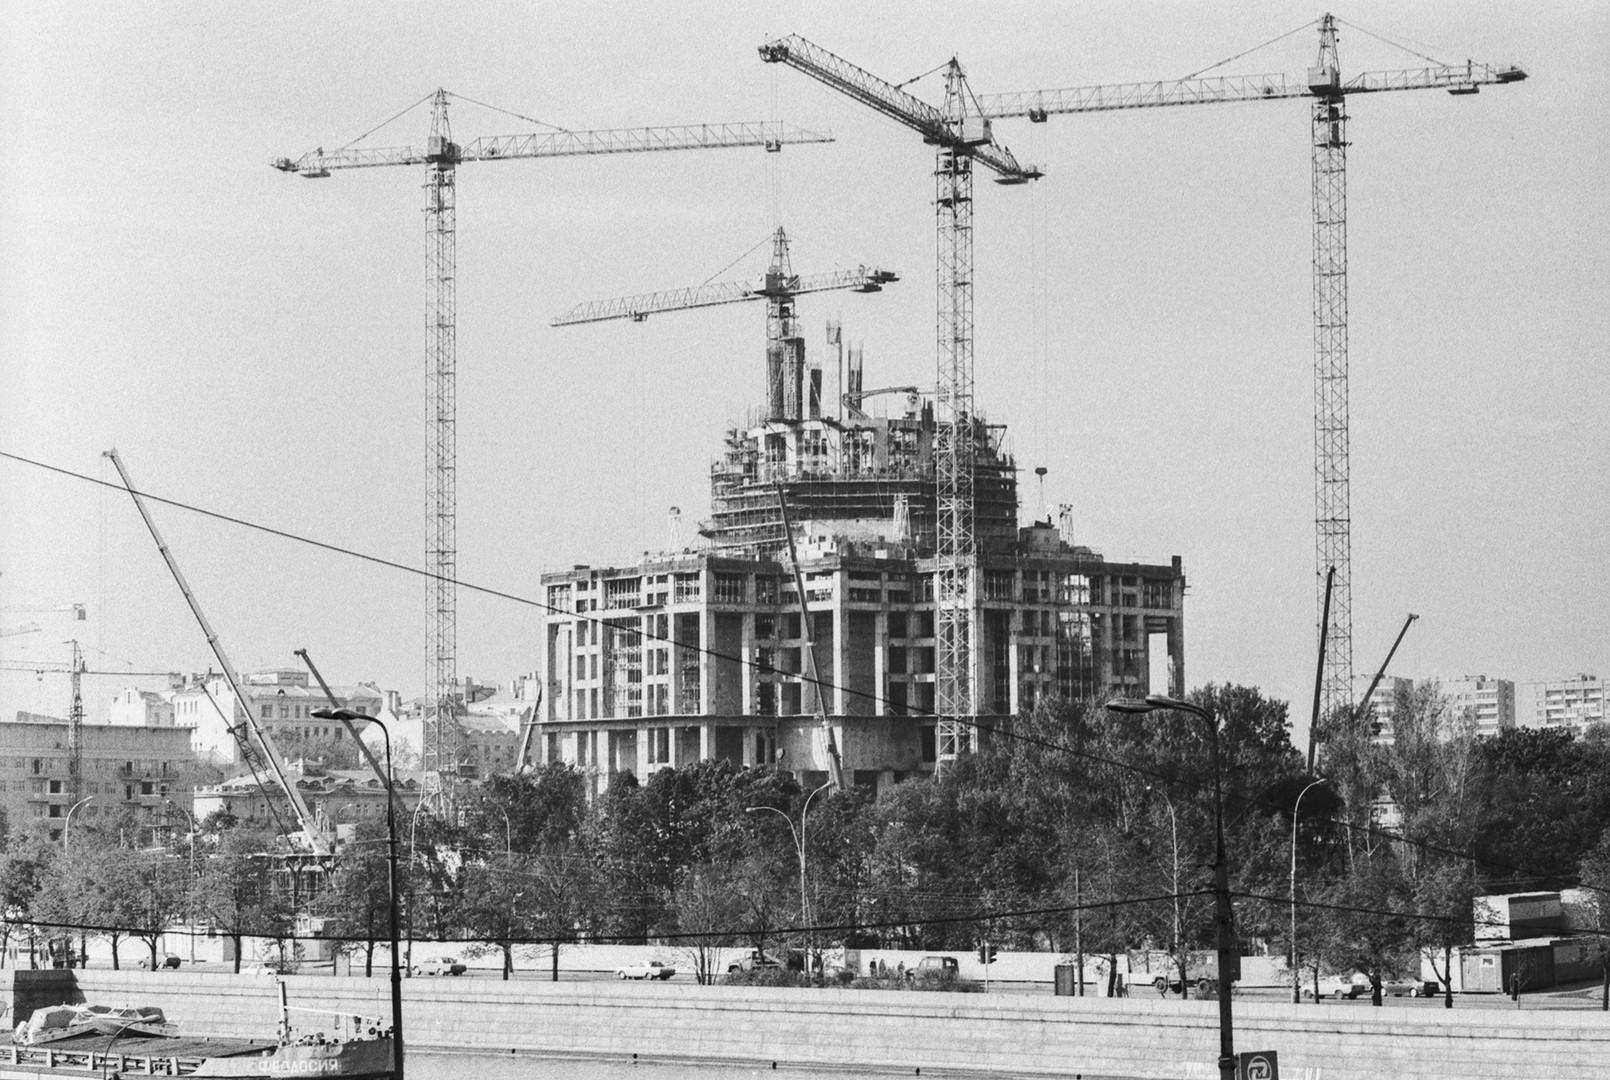 Wiederaufbau, 1. September 1995